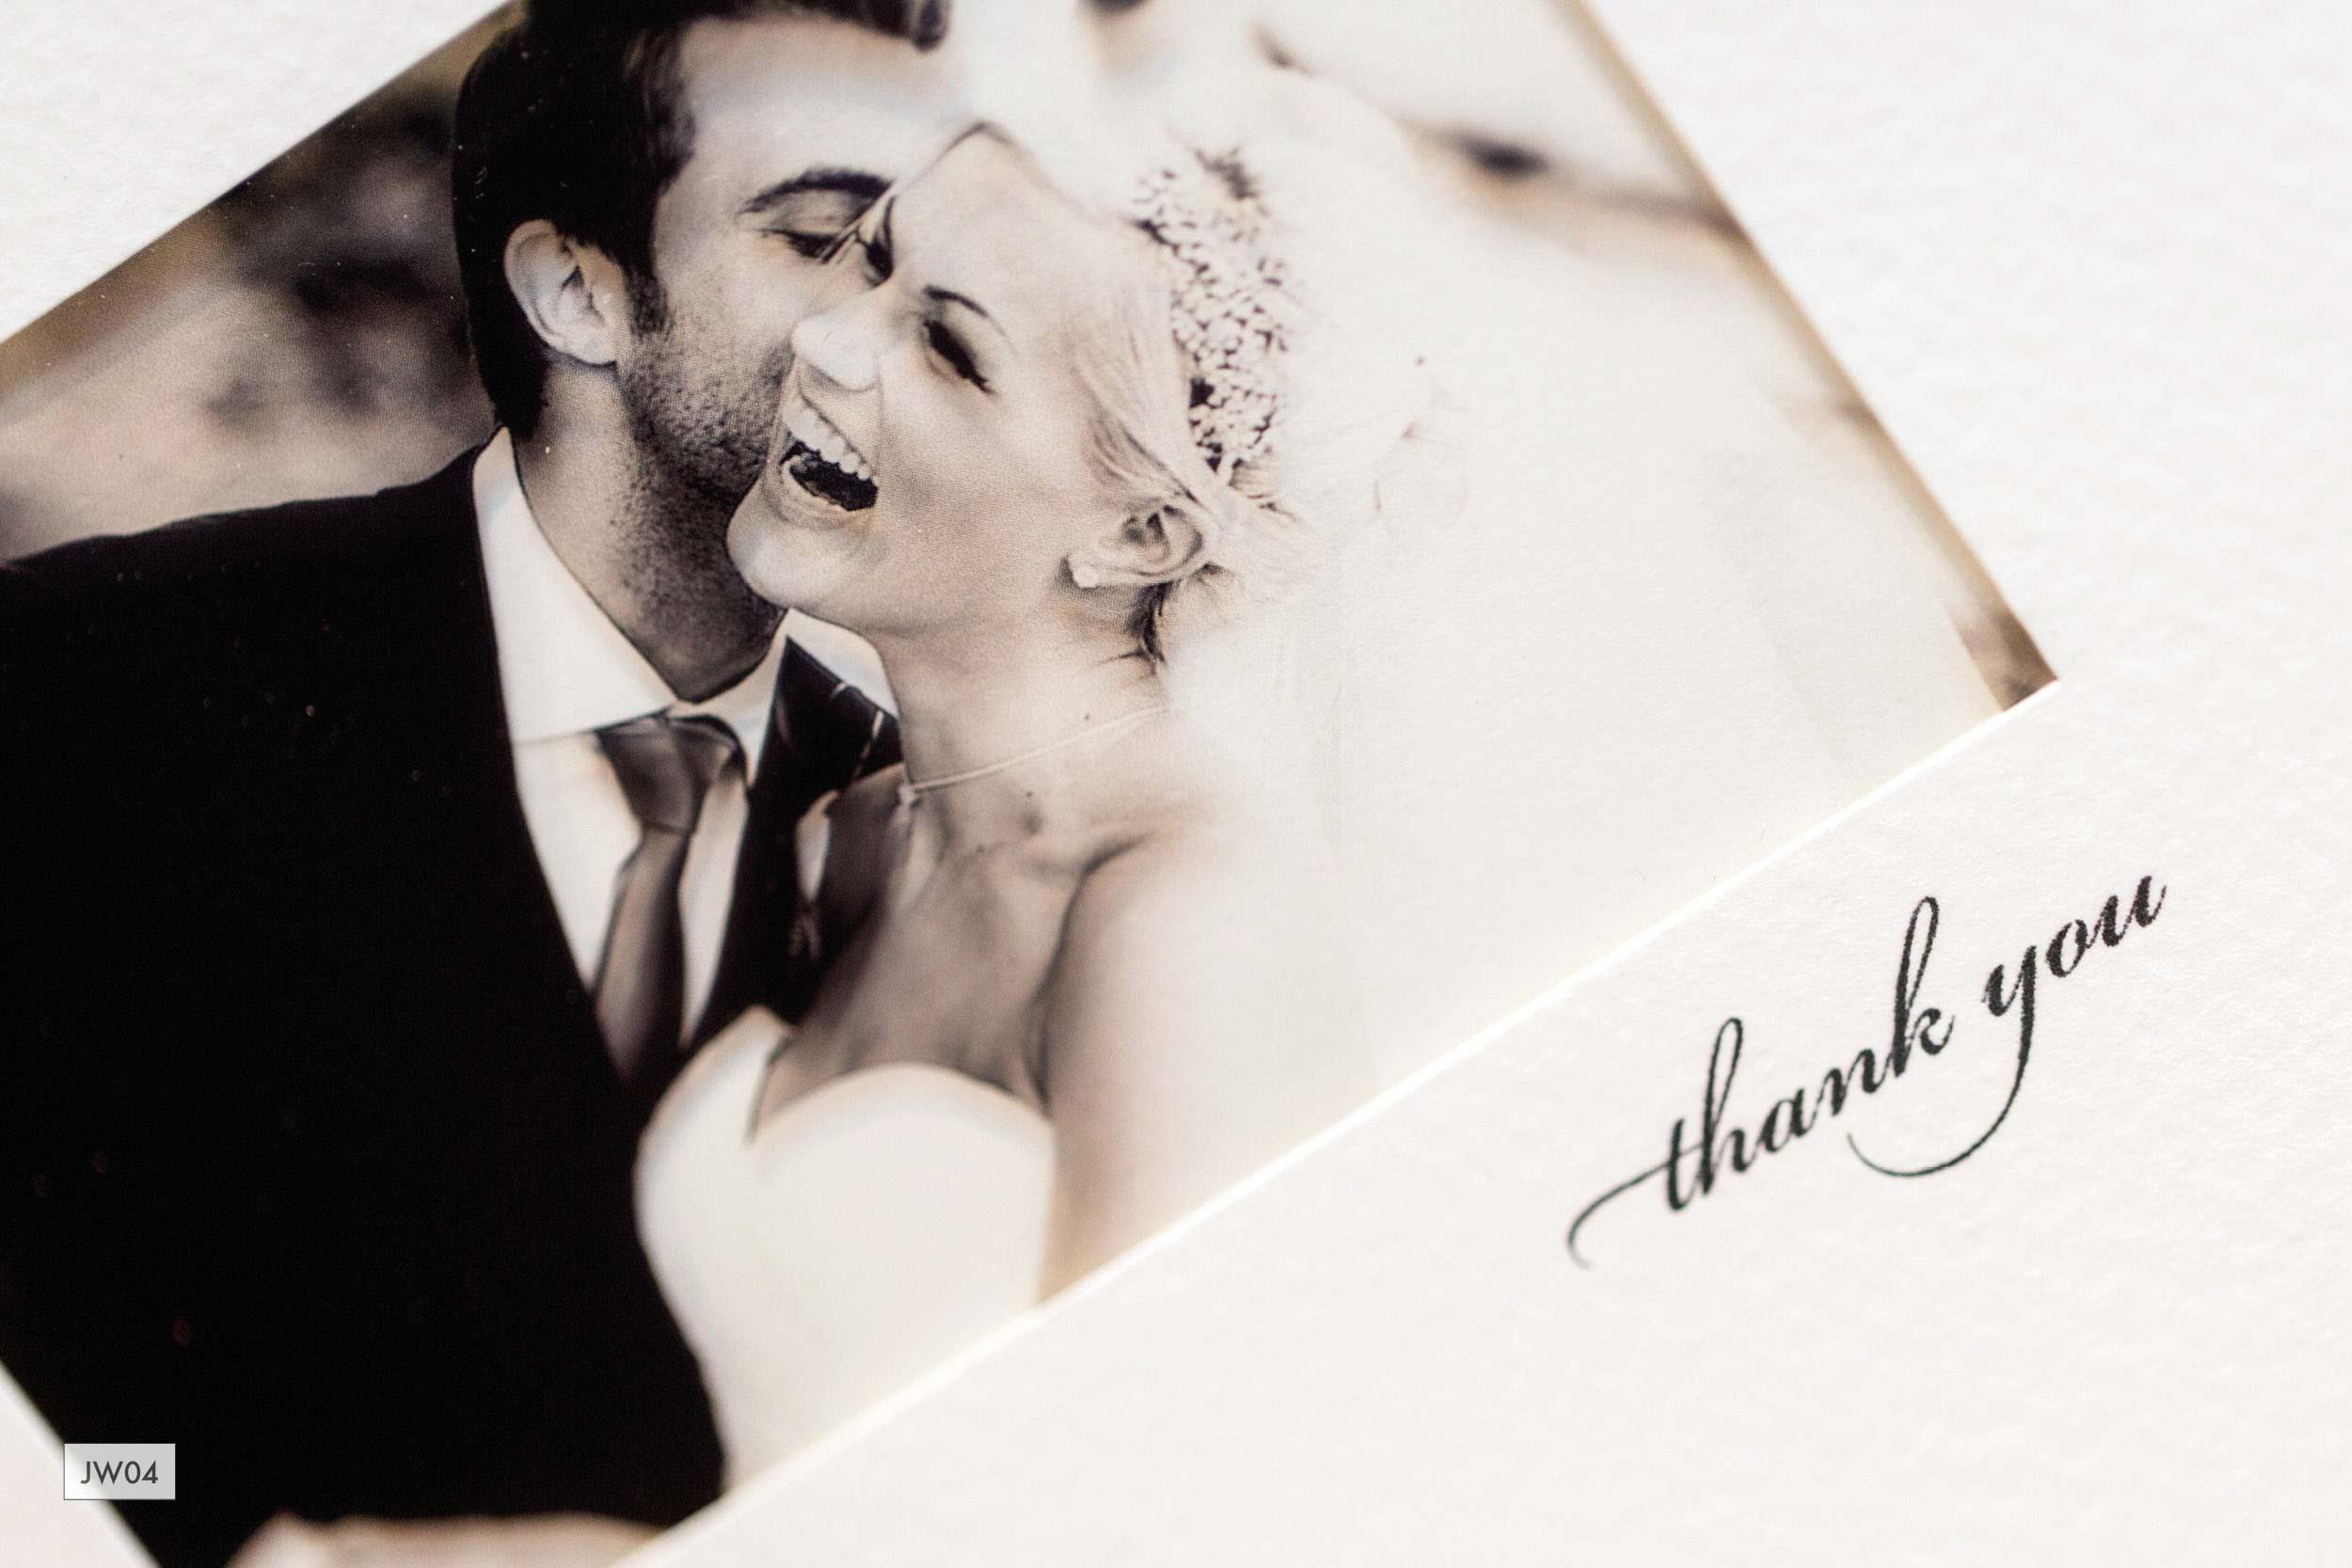 Photographic-thank-you-card_jersey-weddings_ananyacards.com-02.jpg